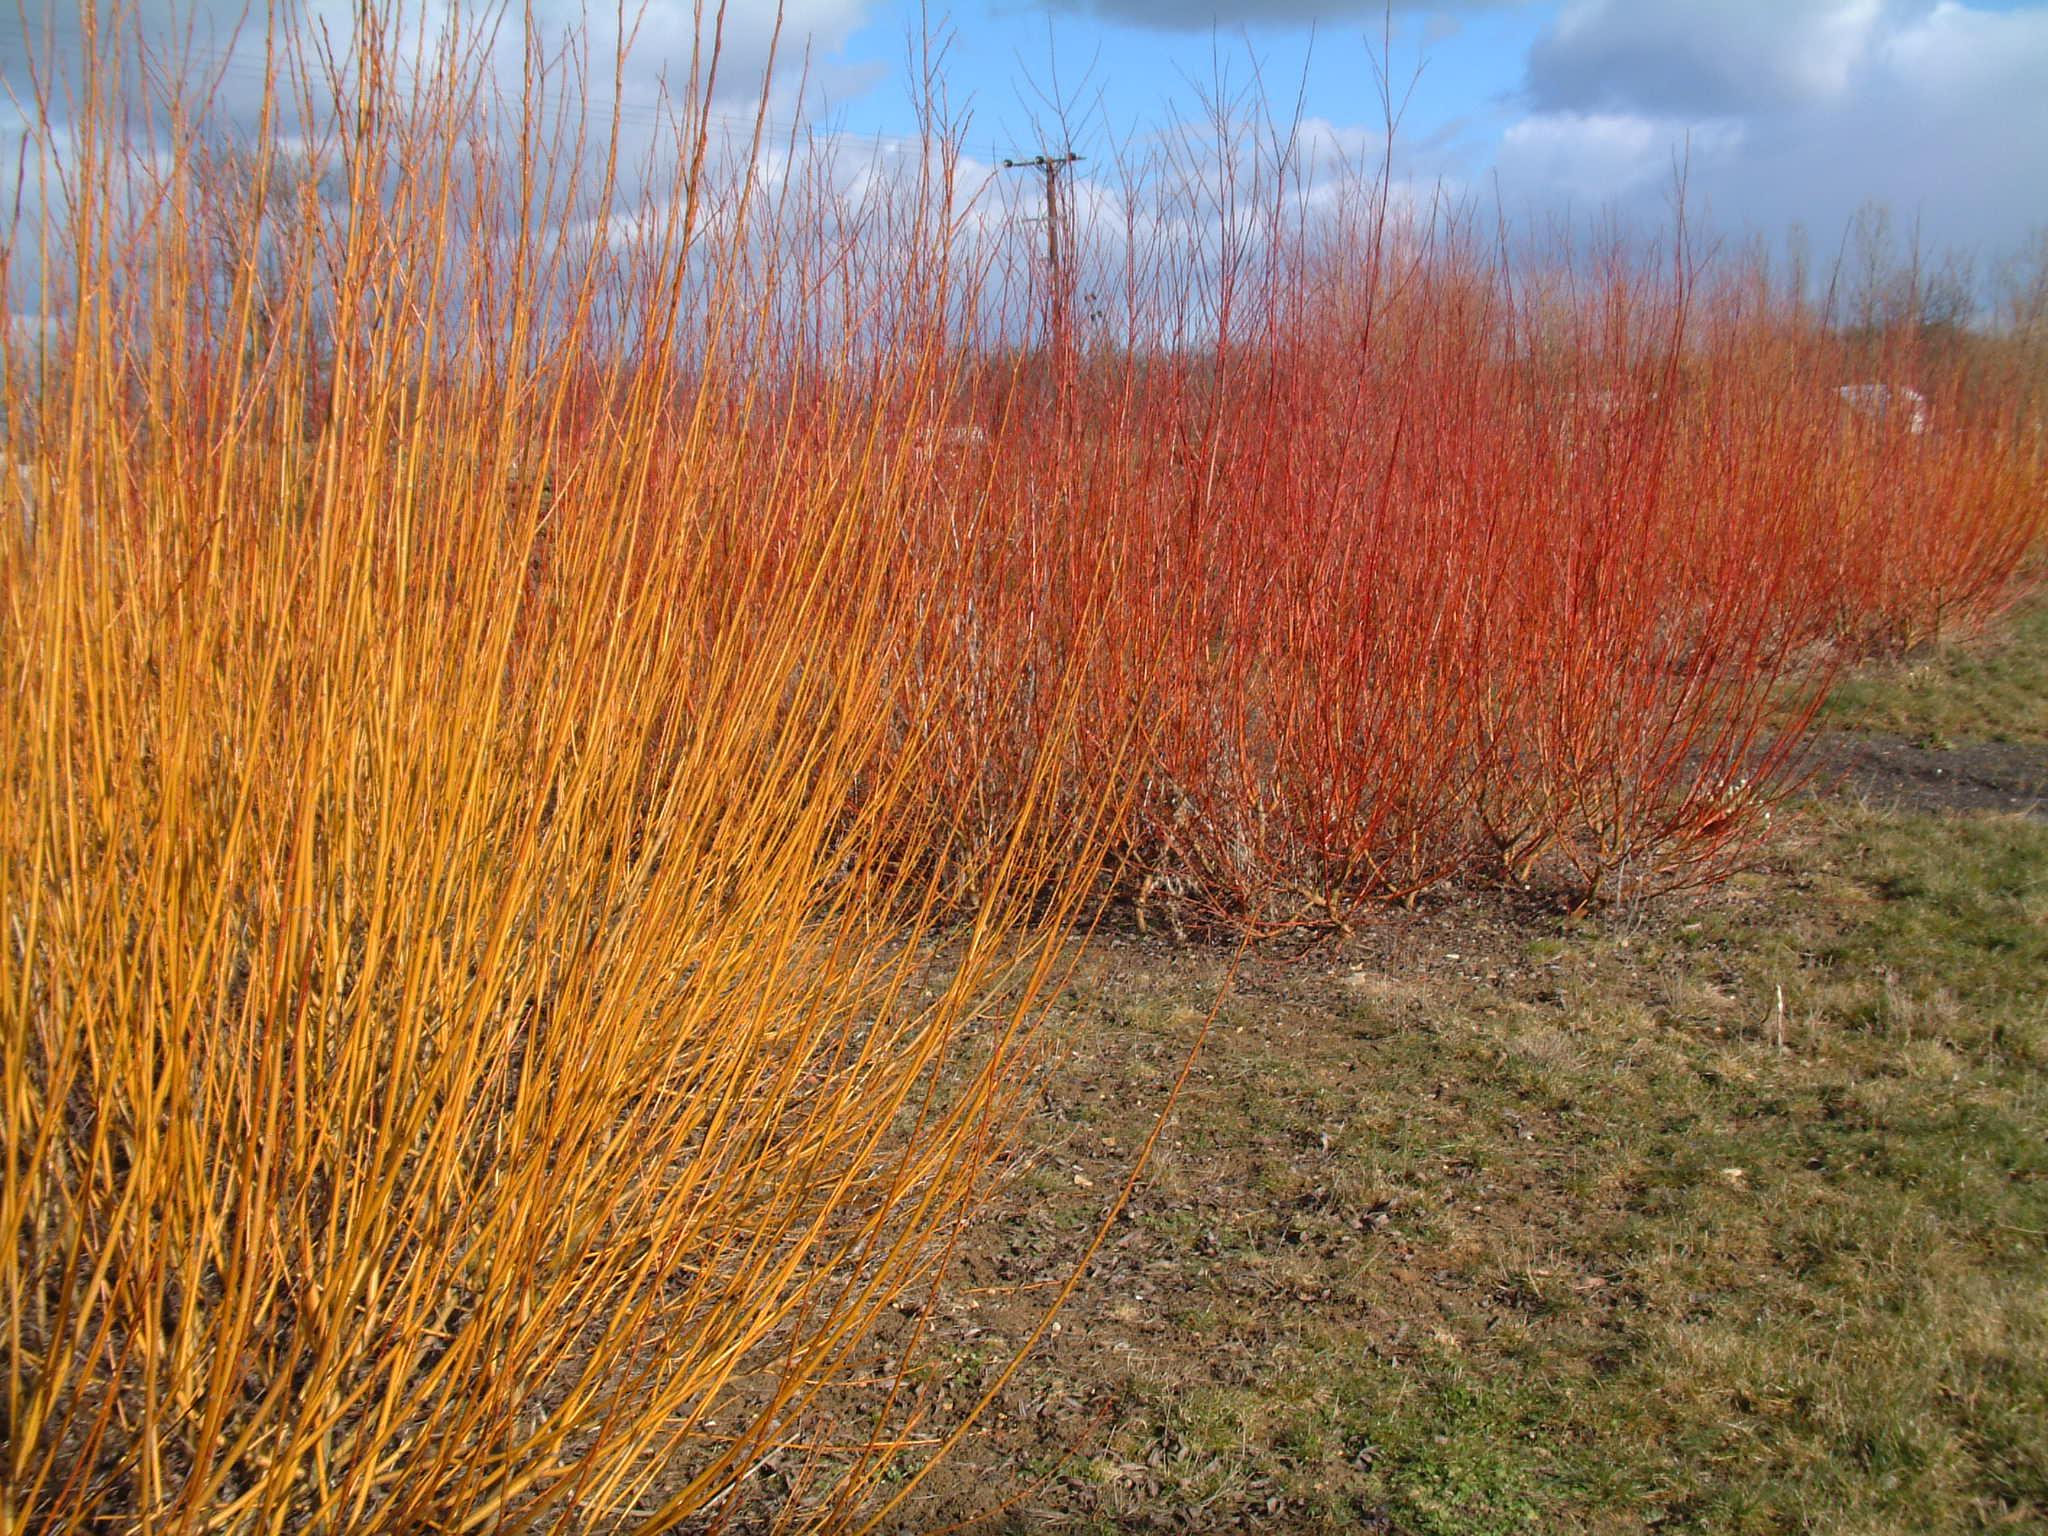 Salix Alba Vitellina and Salix alba Britzensis at Willows Nursery